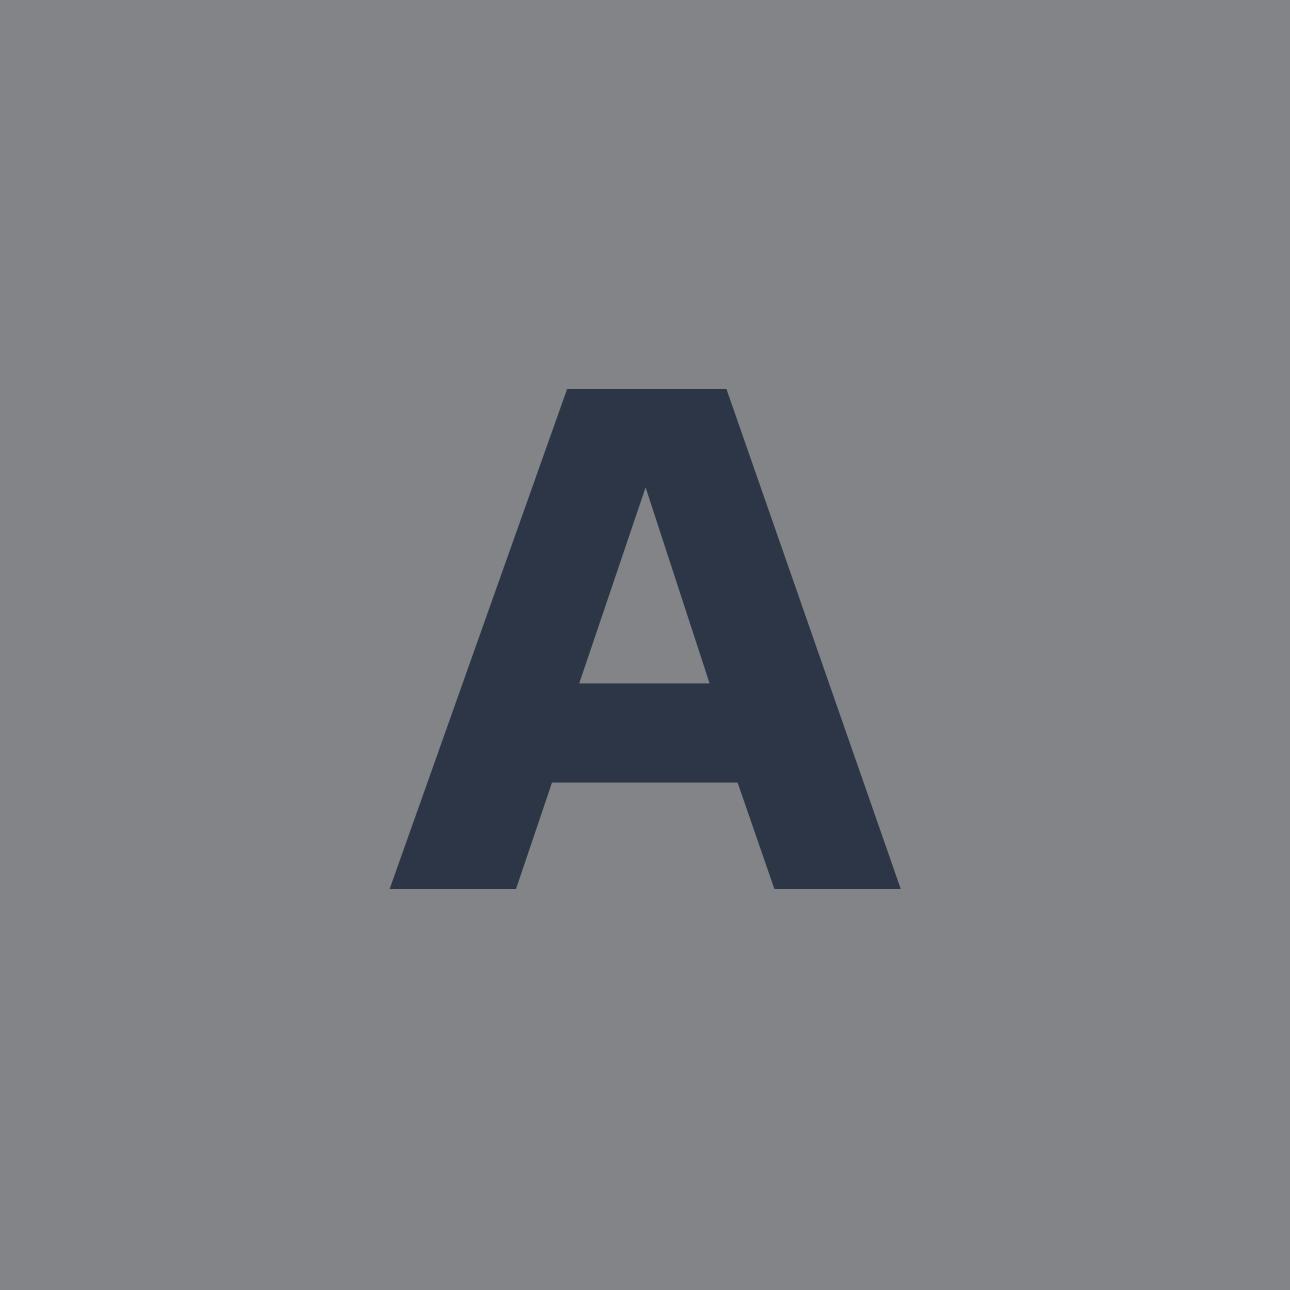 Alberta Line Find Inc logo